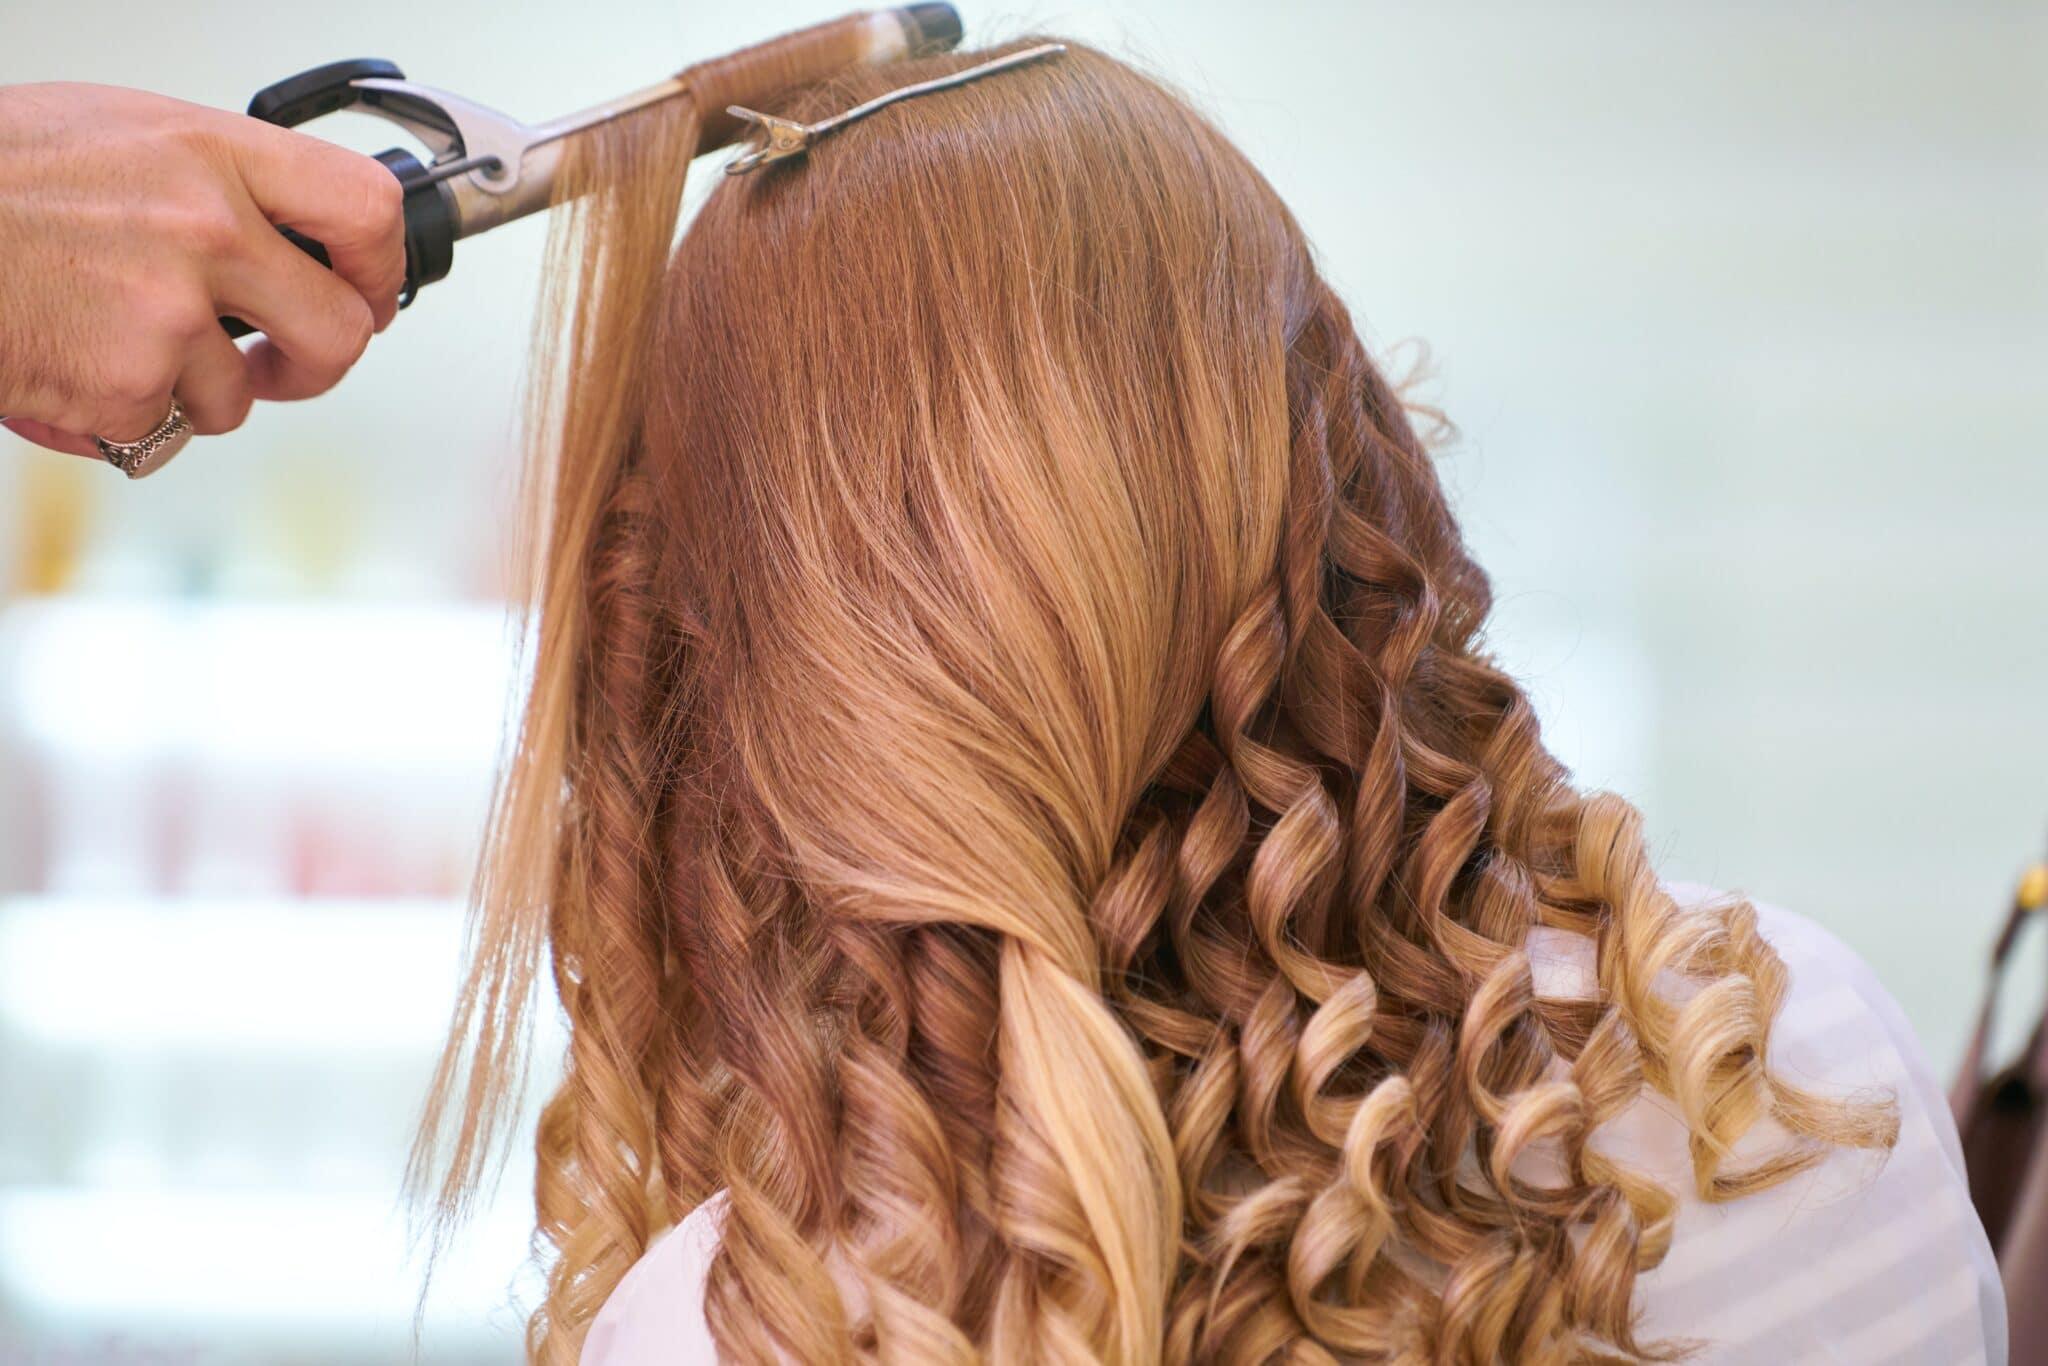 hair salon in kenosha, wedding hairdo kenosha, women haircut kenosha